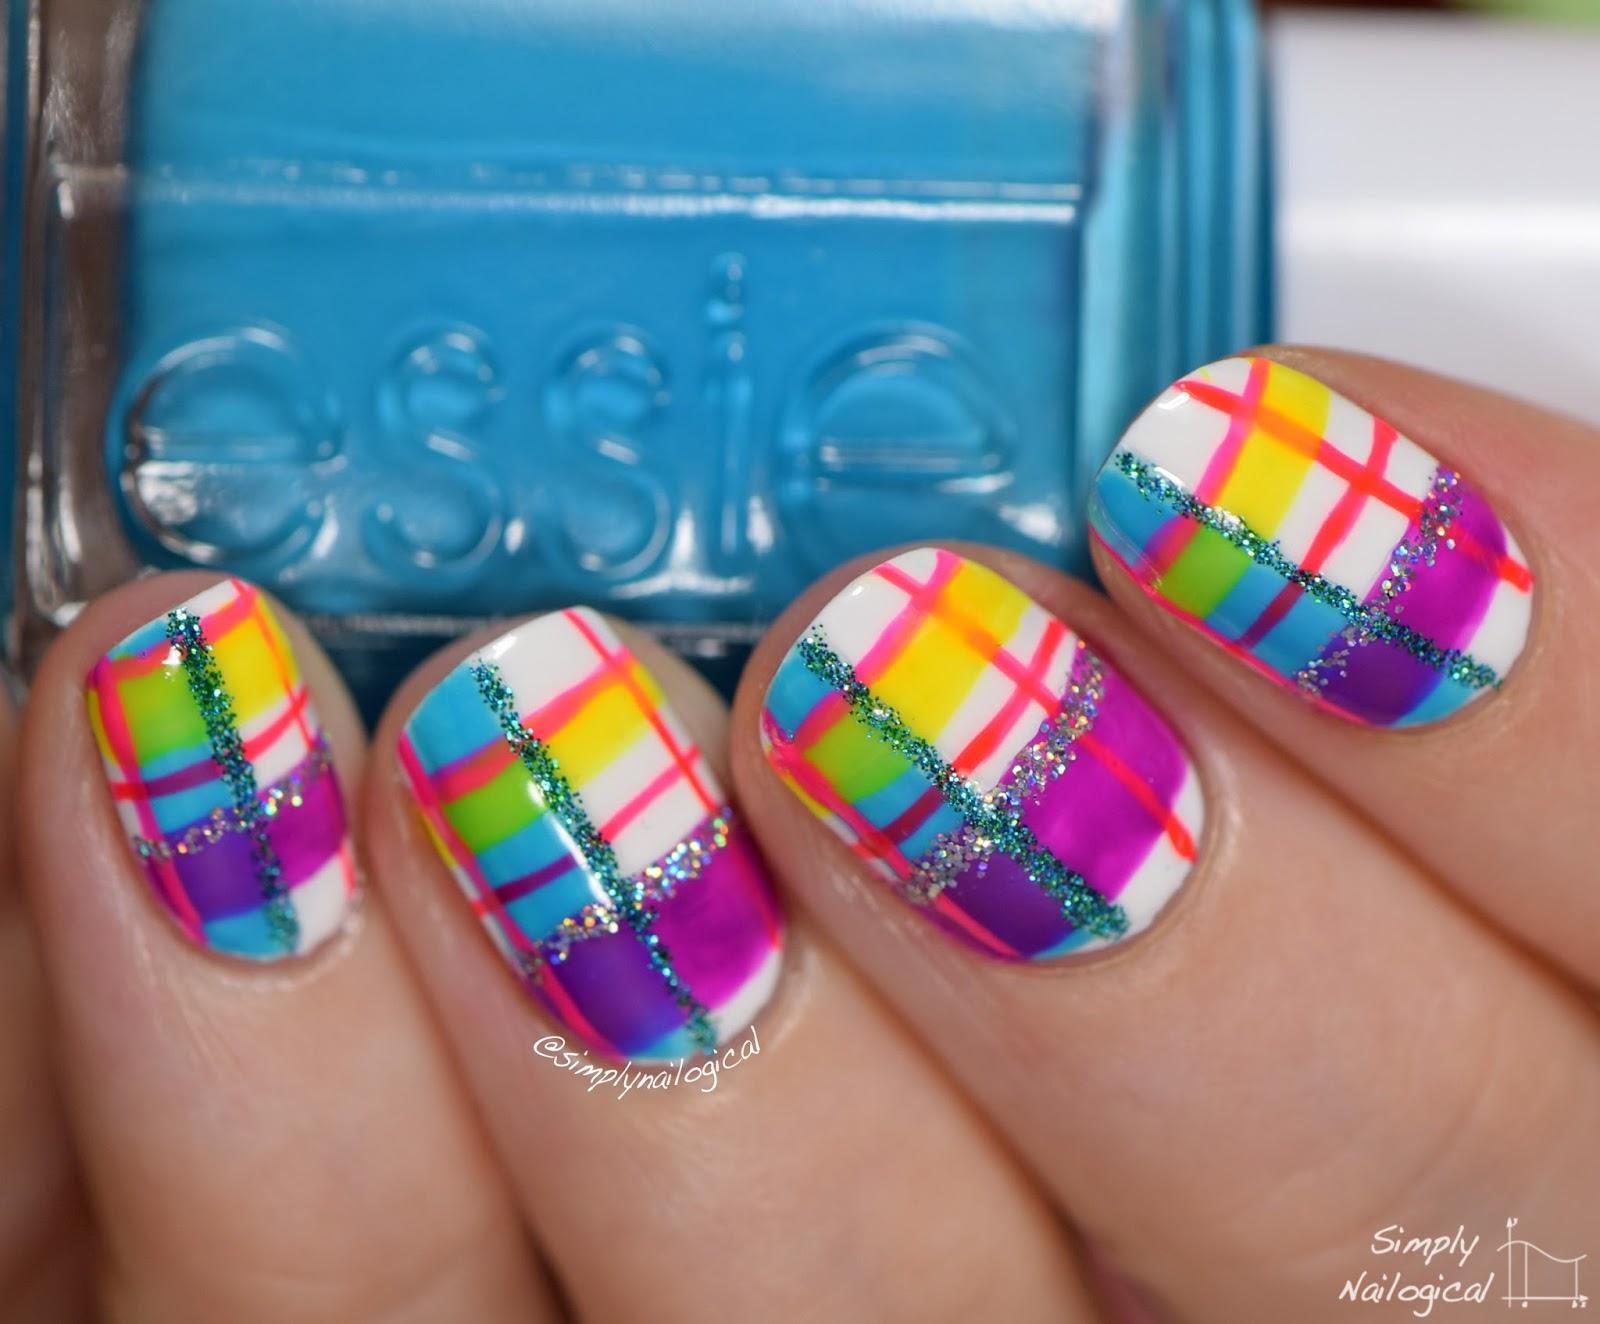 Simply Nailogical: Neon plaid re-creation mani